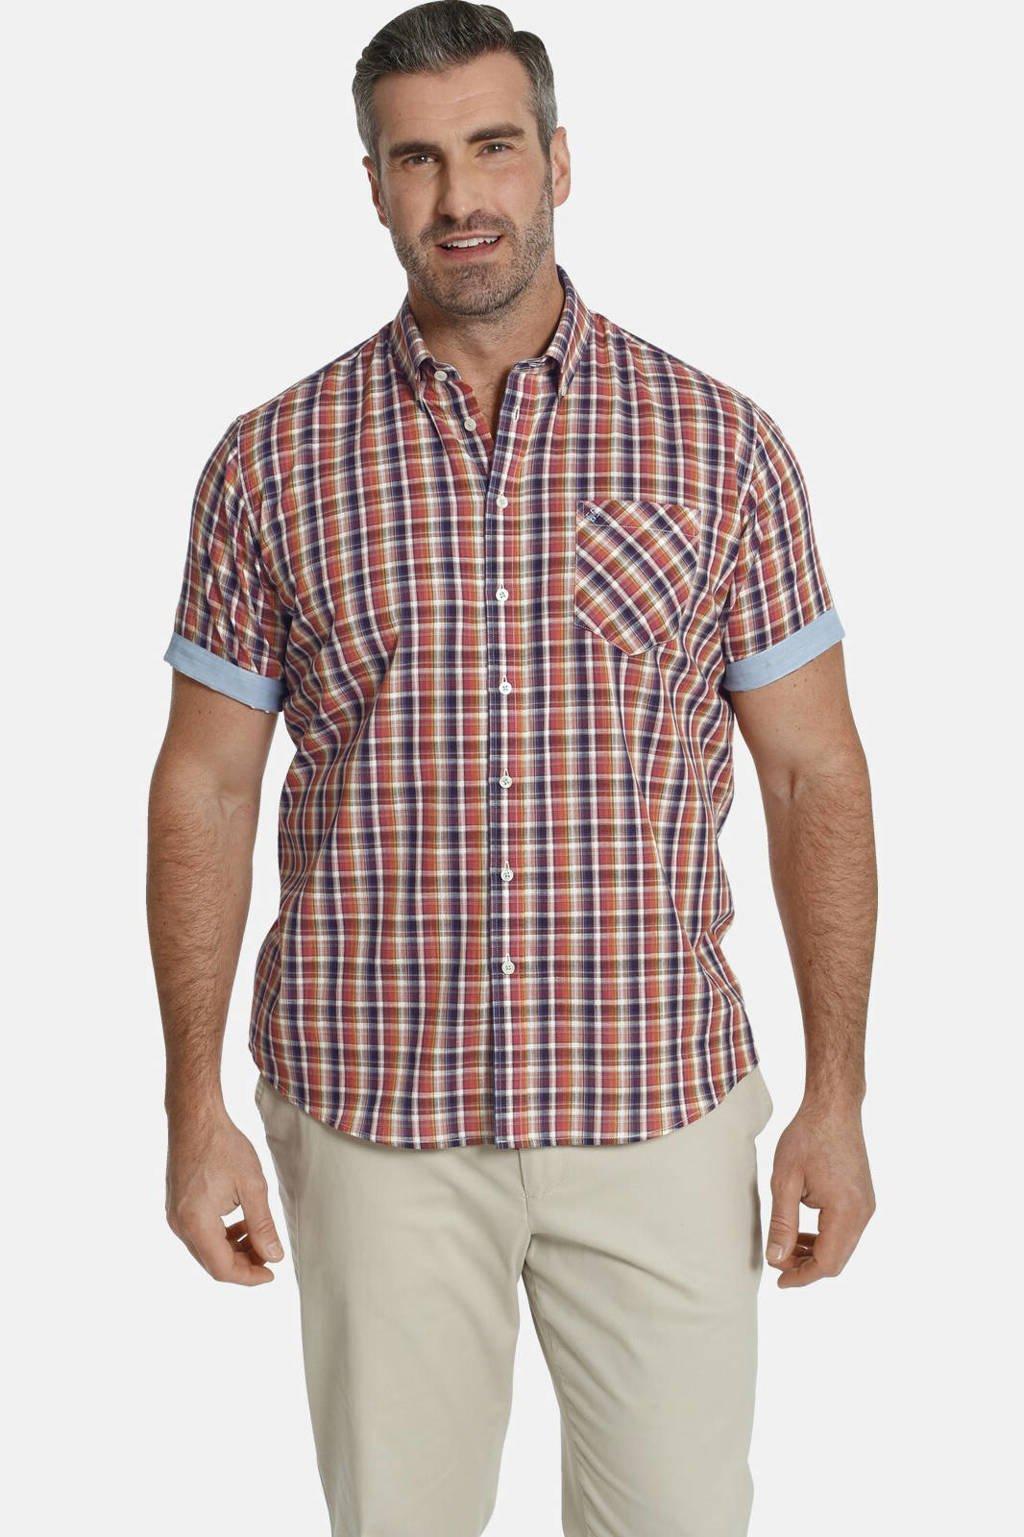 Charles Colby overhemd (set van 2) DUKE VILLOD Plus Size lichtblauw/rood, Lichtblauw/rood